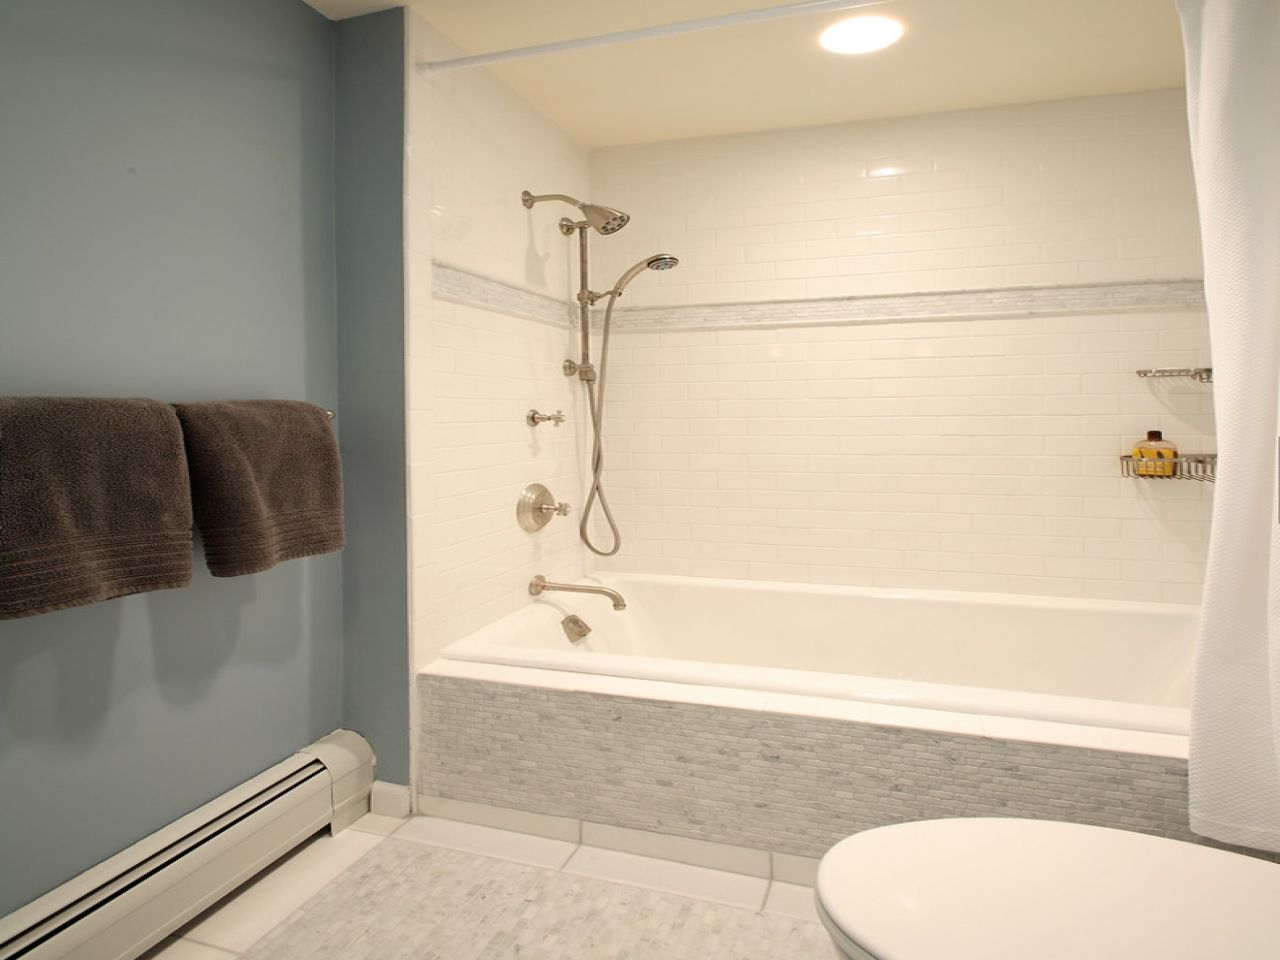 Latest Posts Under: Bathroom jacuzzi | bathroom design 2017-2018 ...